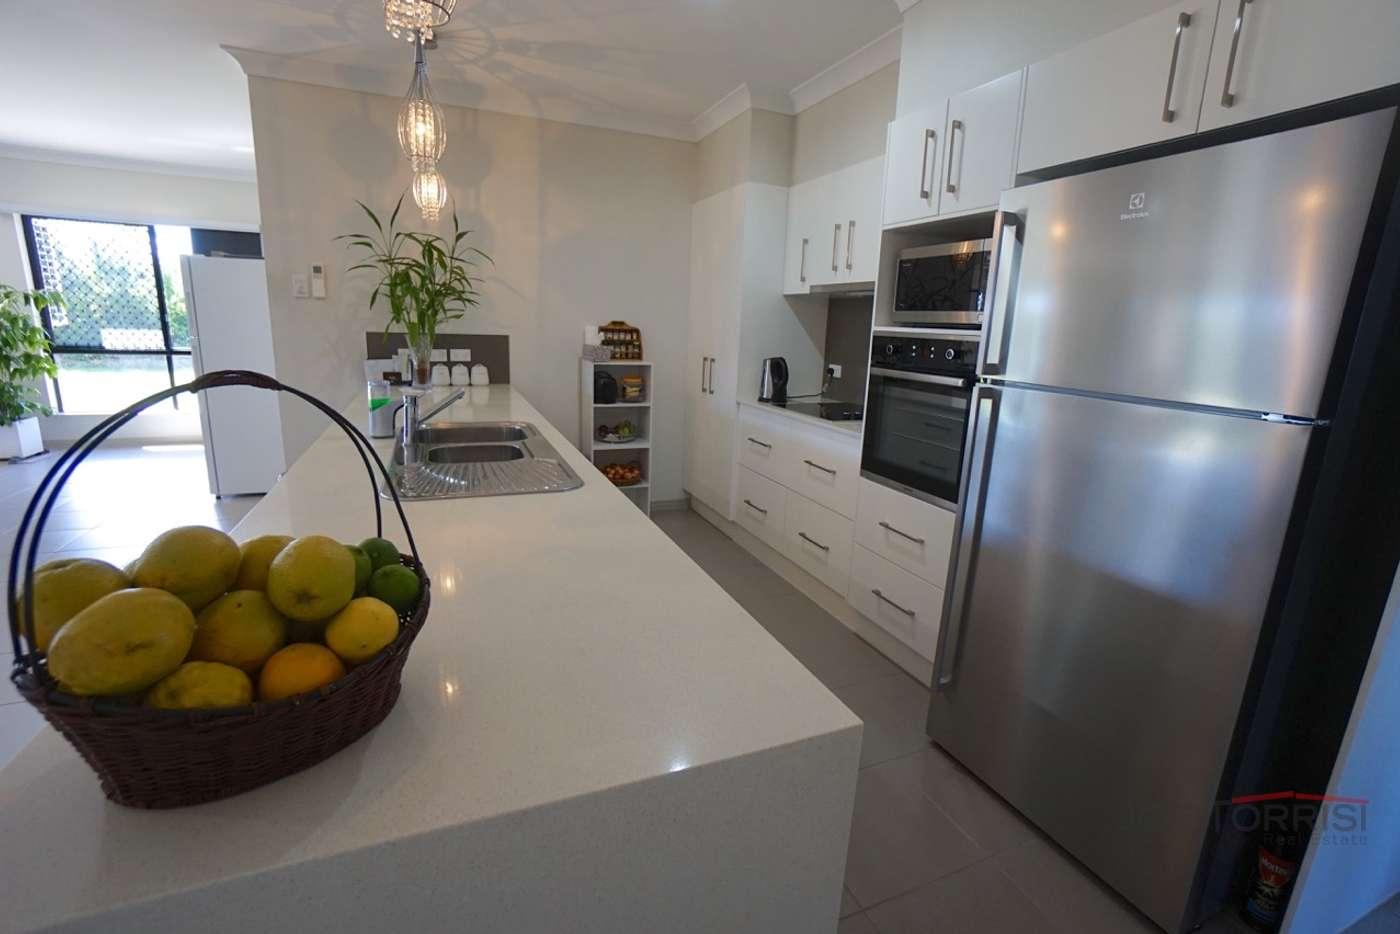 Seventh view of Homely house listing, 88 Hoolahan Drive, Mareeba QLD 4880